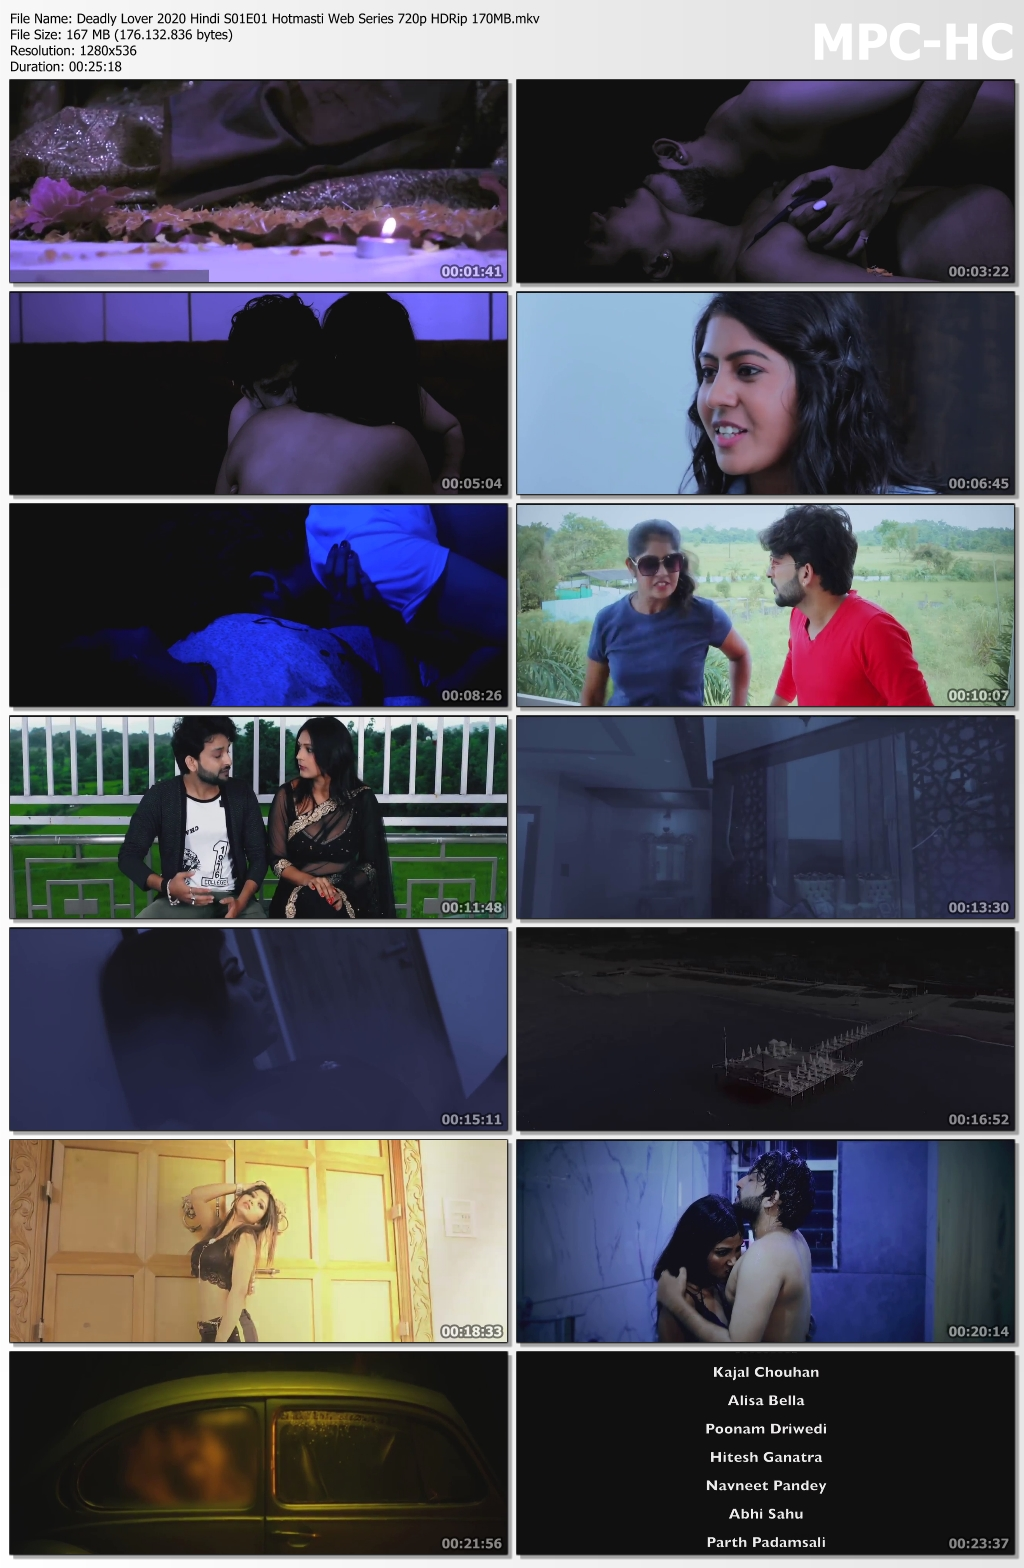 Deadly-Lover-2020-Hindi-S01-E01-Hotmasti-Web-Series-720p-HDRip-170-MB-mkv-thumbs